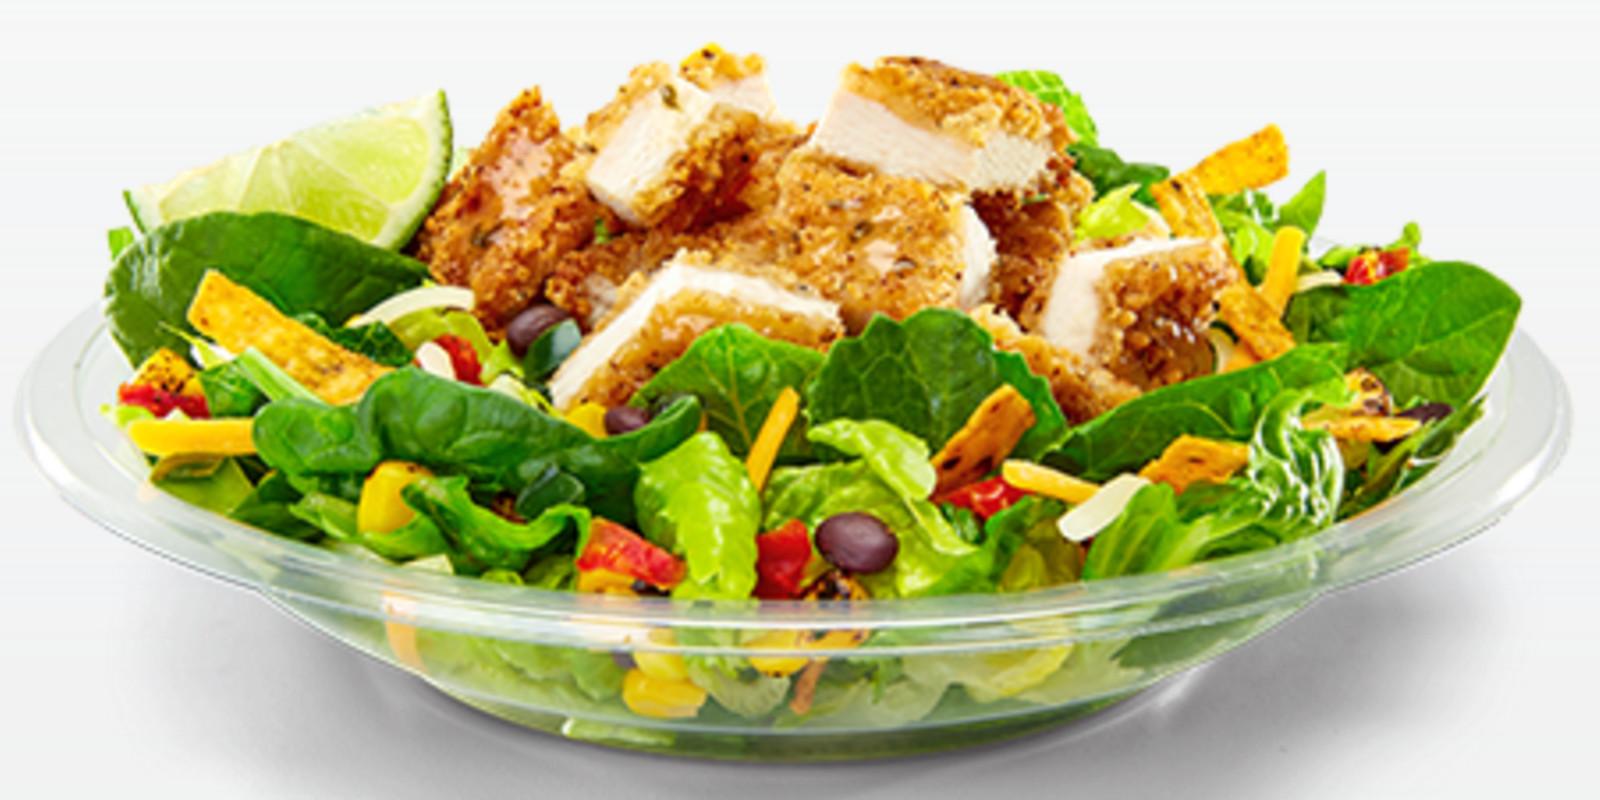 Mcdonalds Salads Healthy  McDonald s Kale Salad Packs More Calories Than a Big Mac